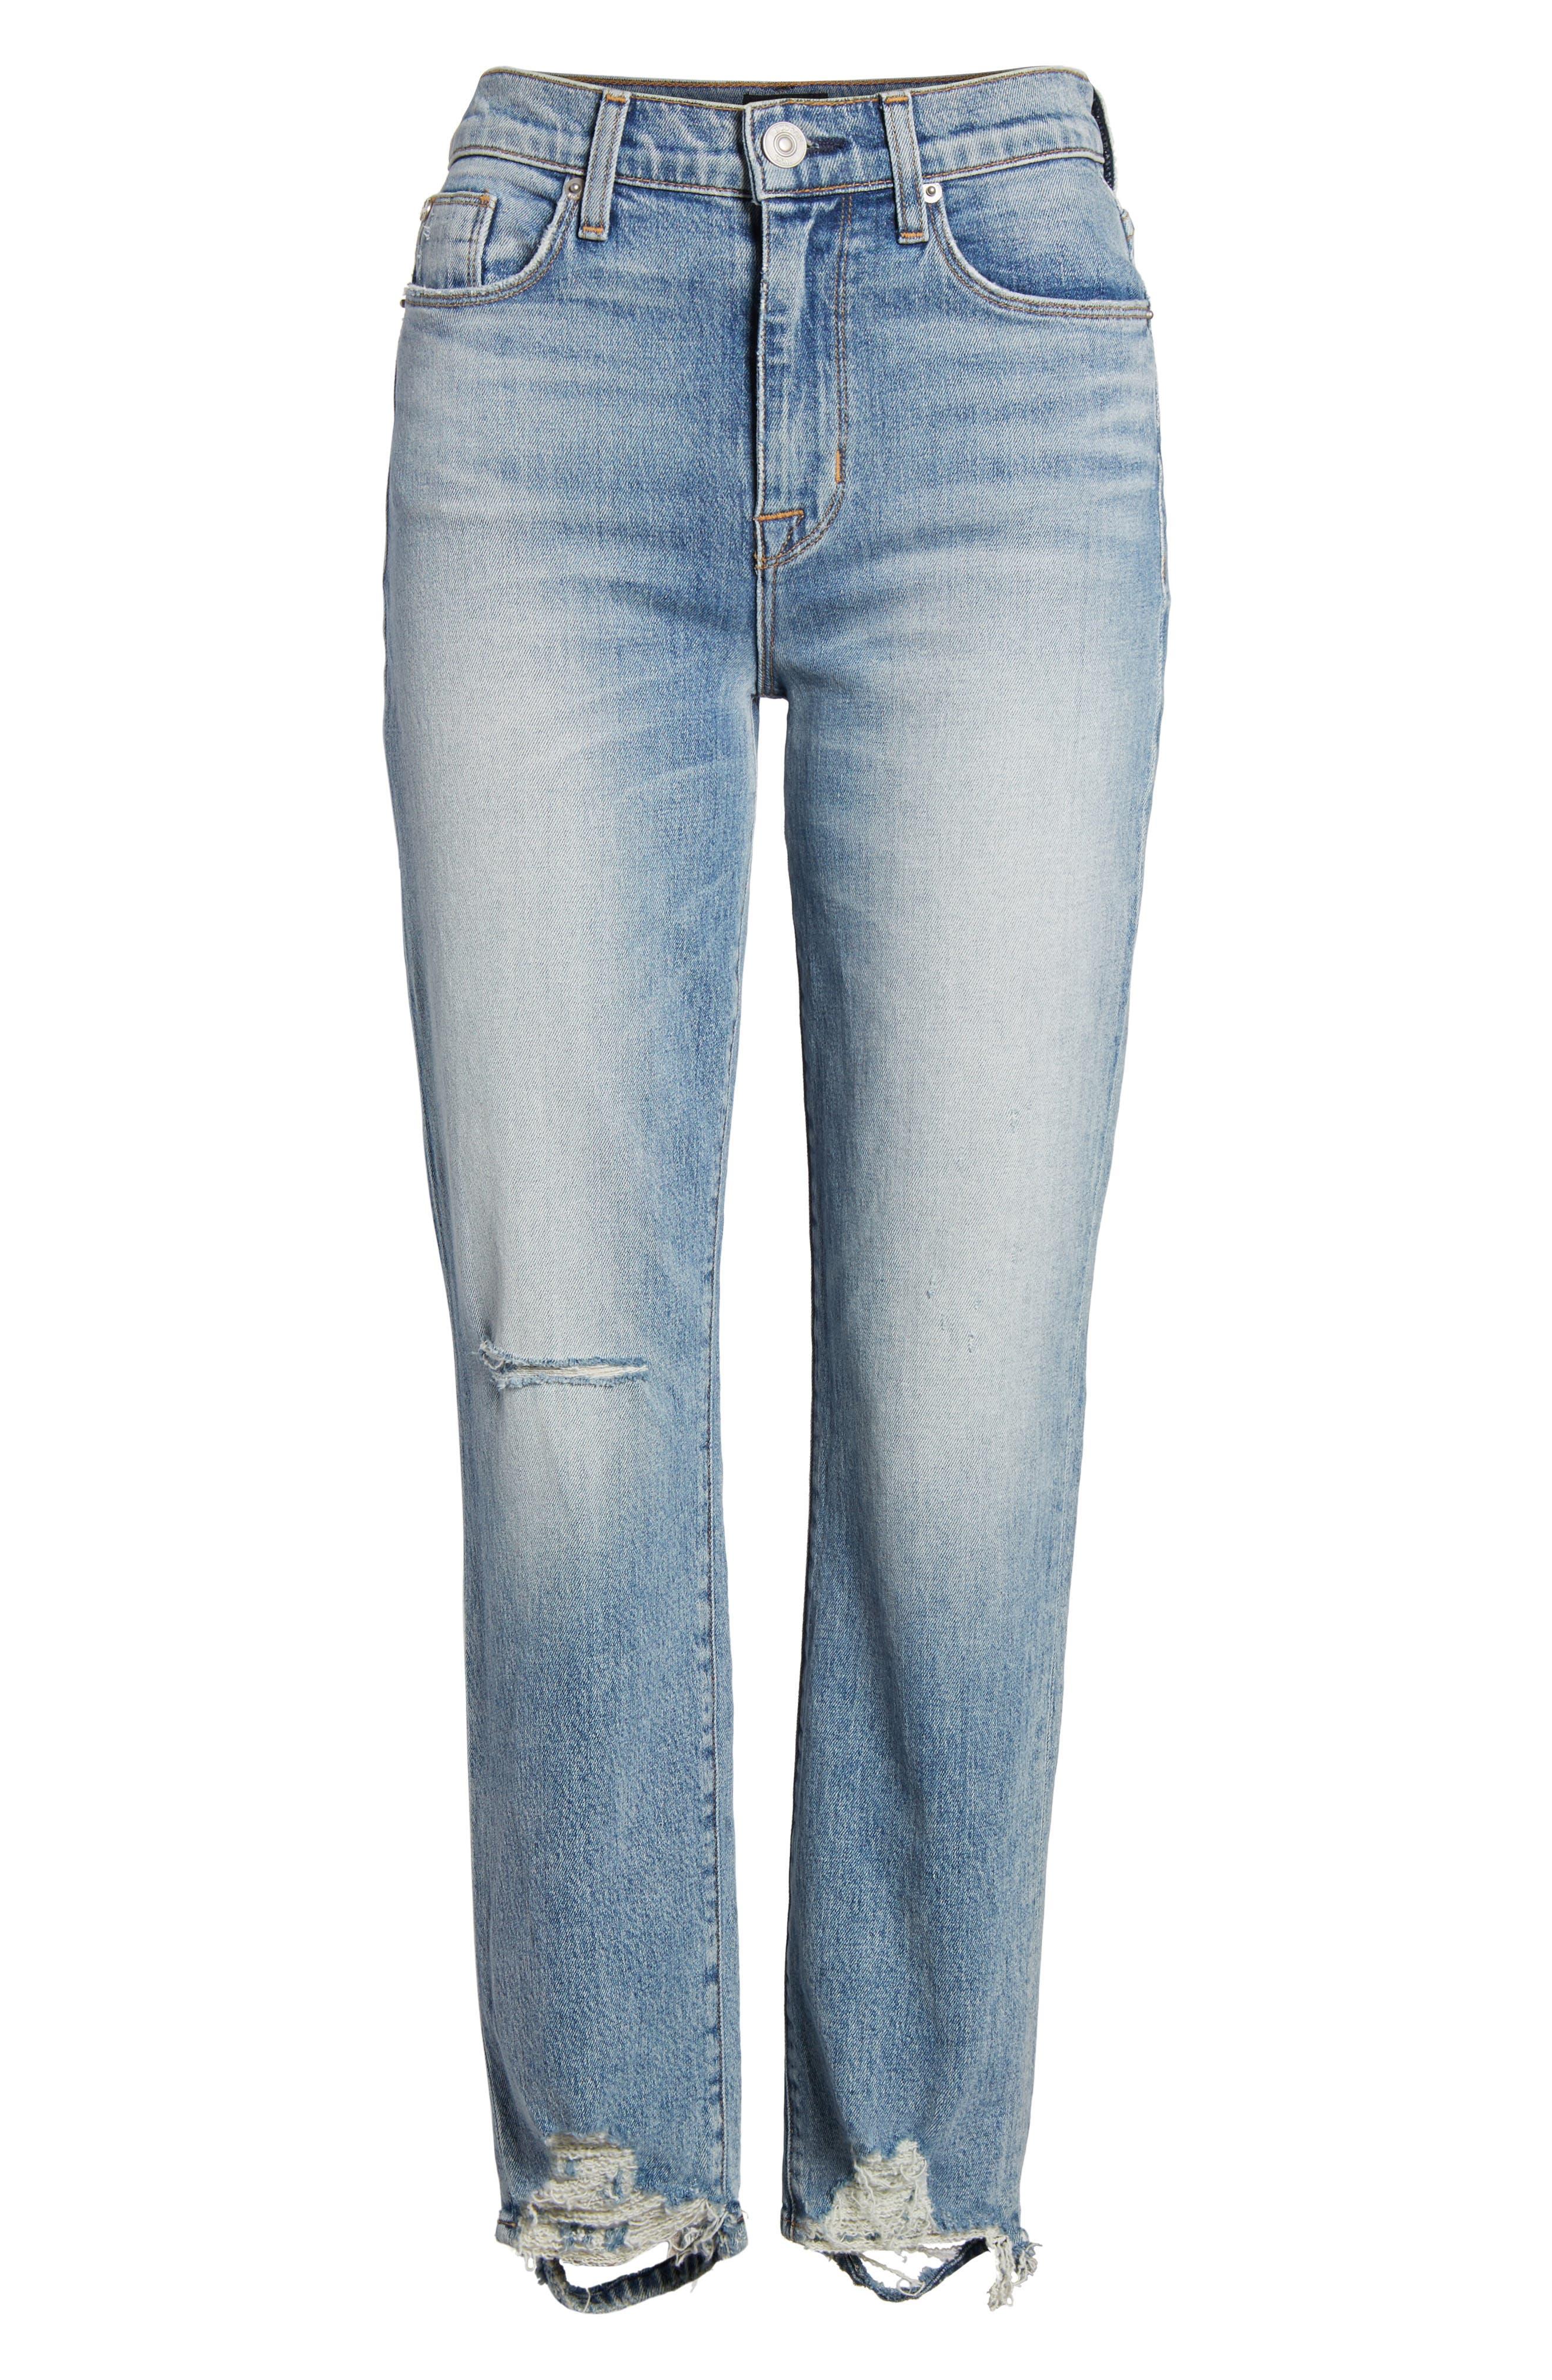 Zoeey High Waist Ankle Straight Leg Jeans,                             Alternate thumbnail 7, color,                             456